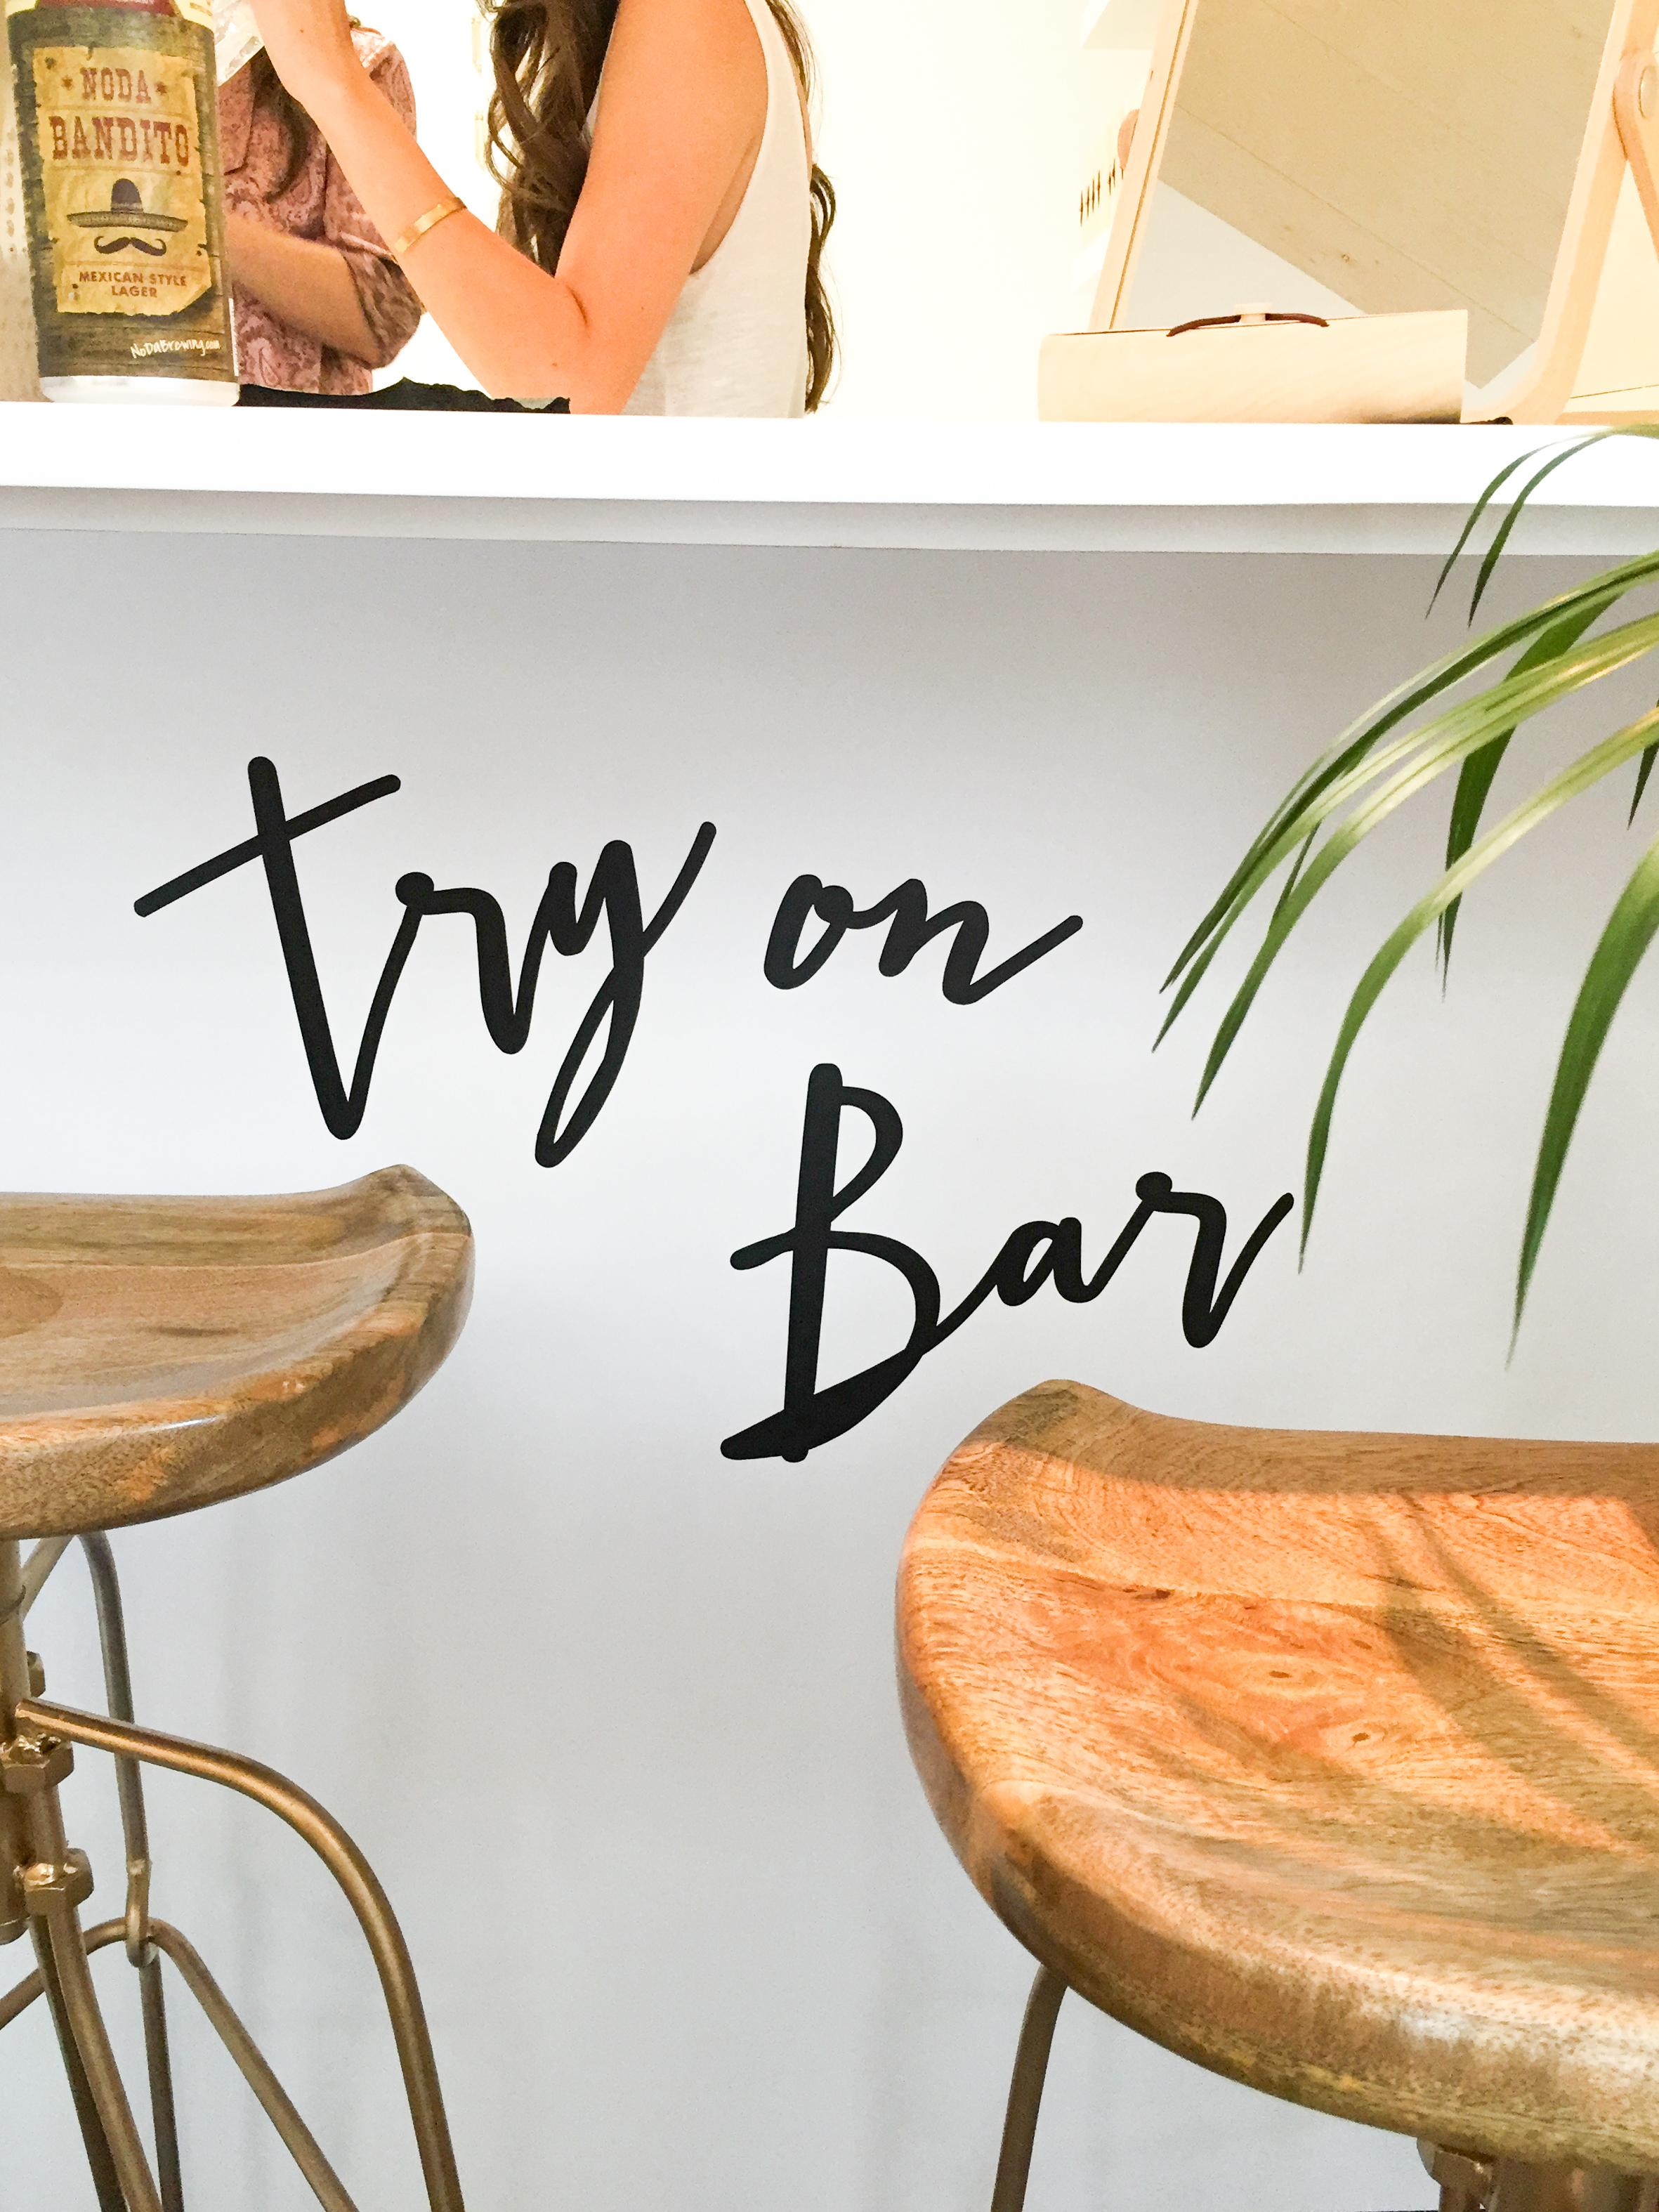 johnny-fly-co-noda-charlotte-nc-try-on-bar